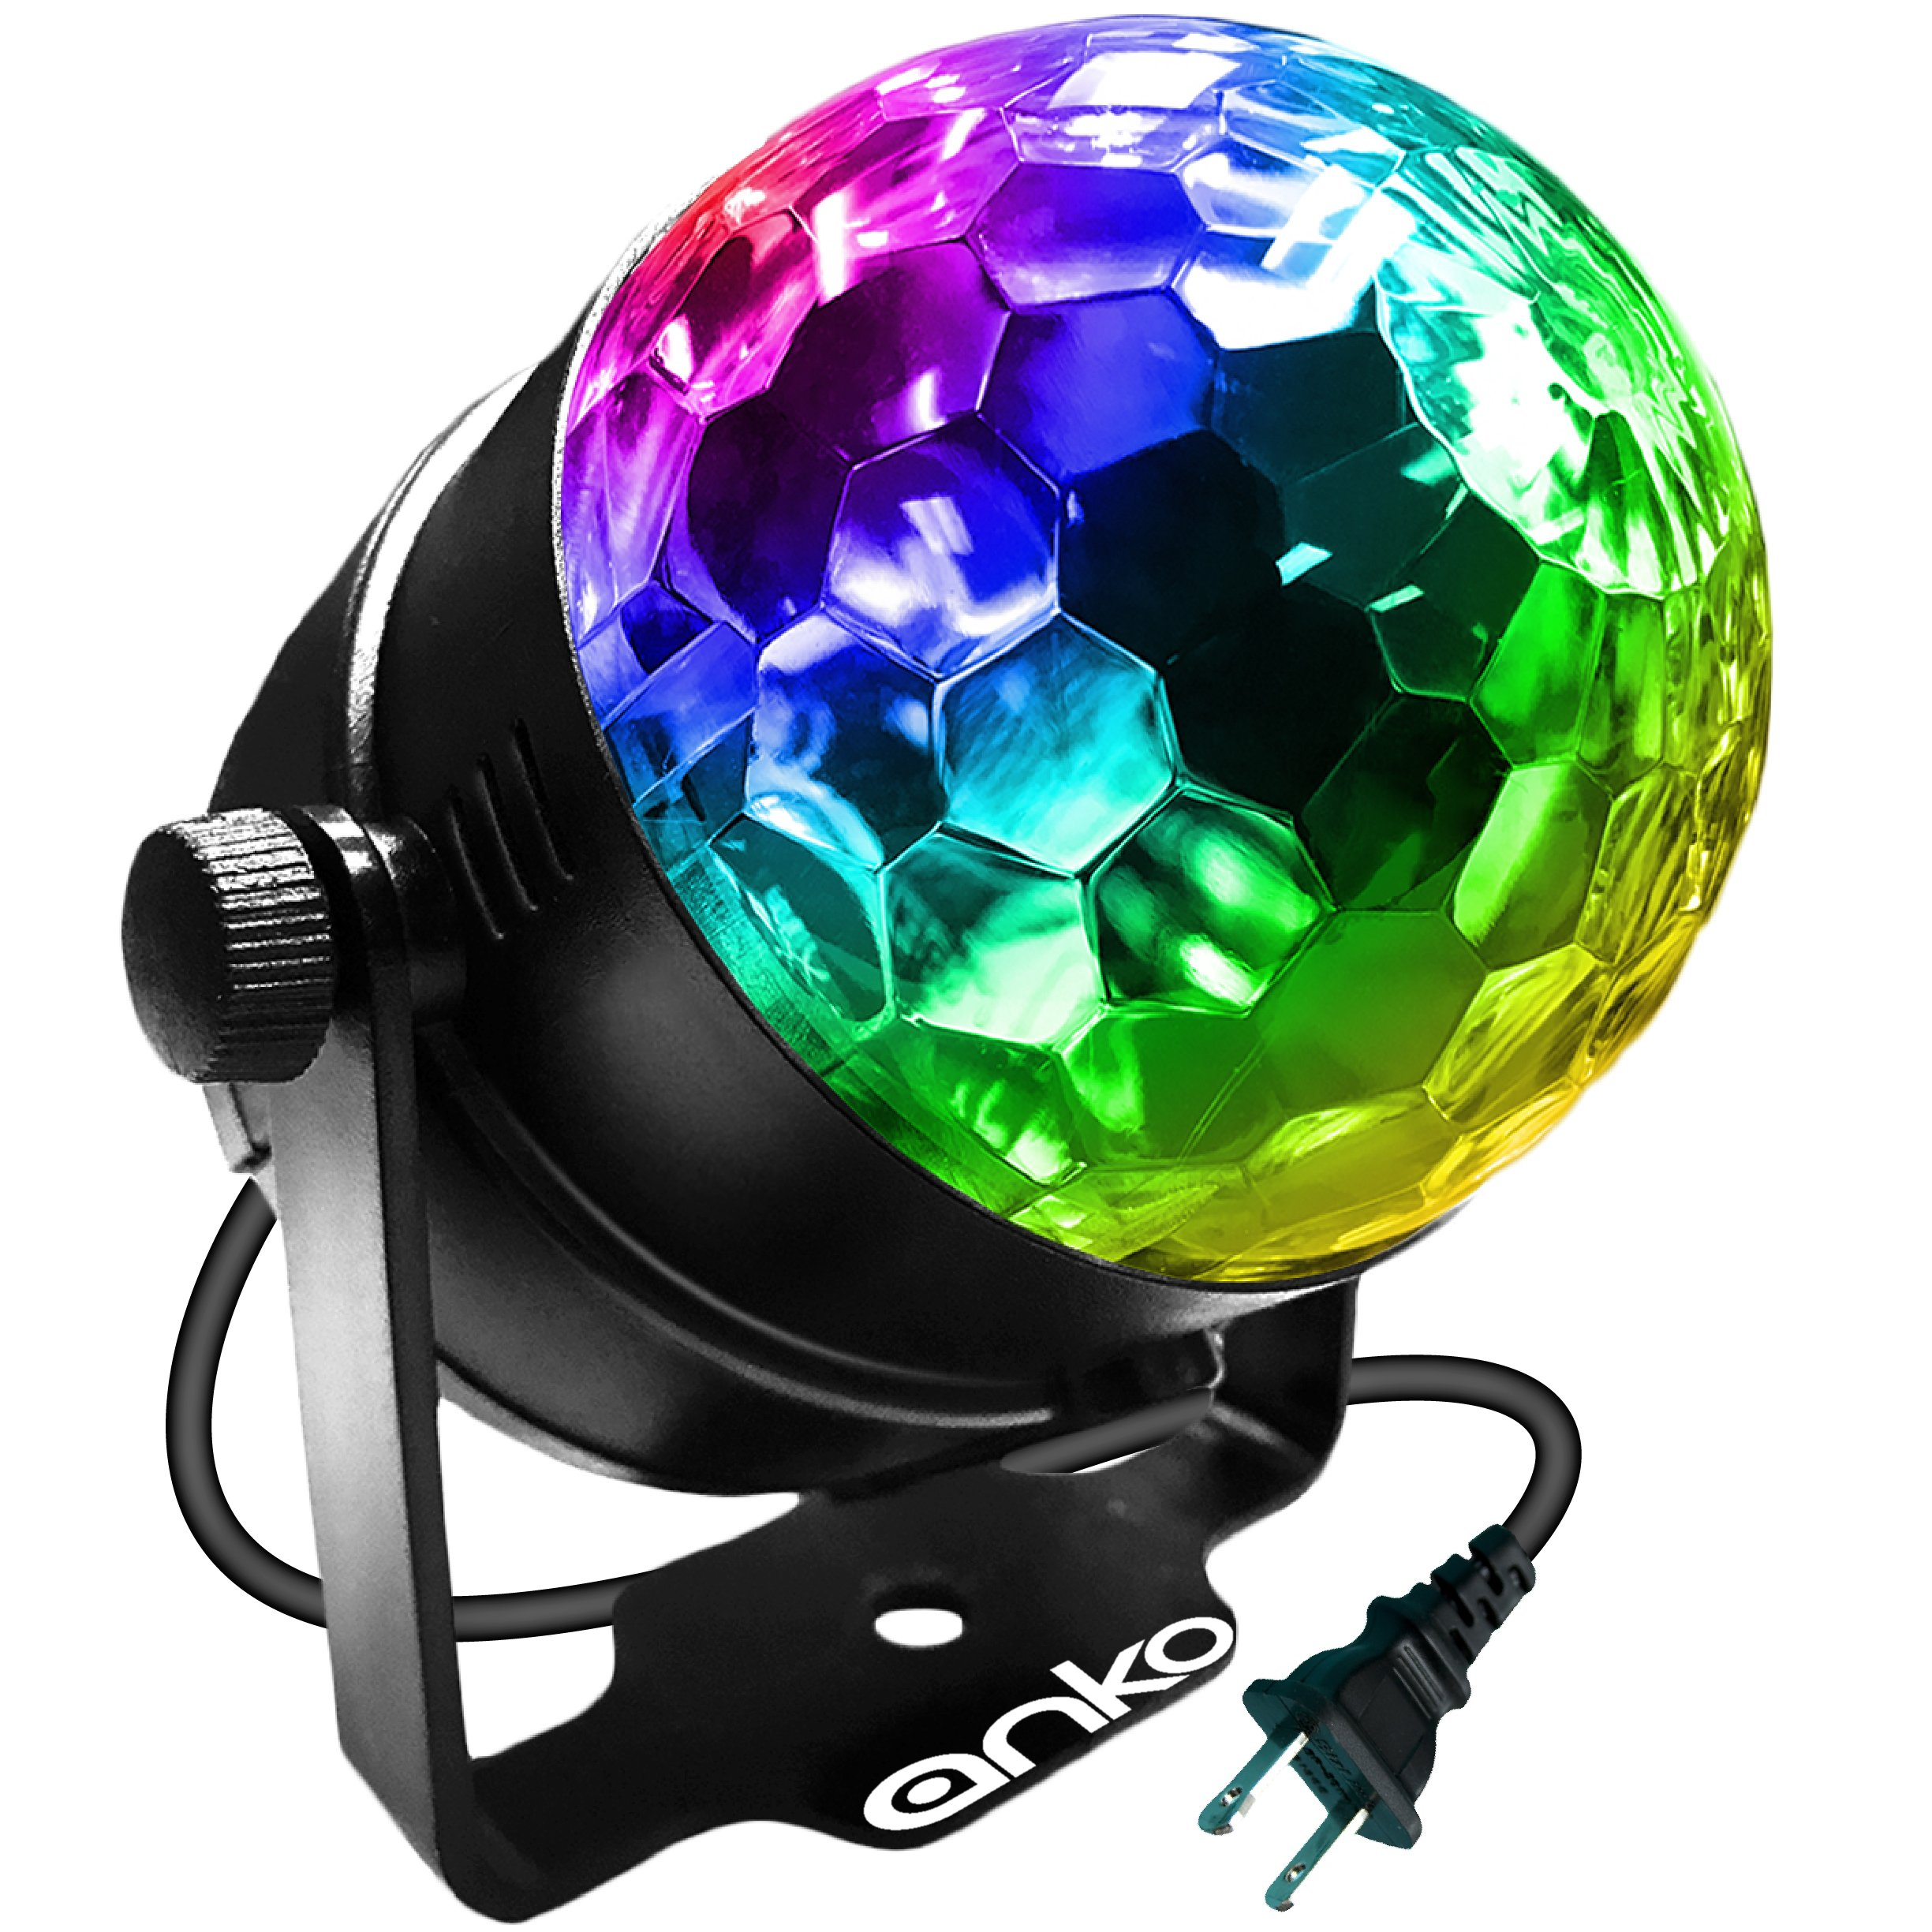 ANKO Mini LED Stage Magic Light, 7 Color Changes Sound Active RGB Mini LED Rotating Magic Ball Lights For KTV, Party, Wedding, Show, Club Pub Disco DJ And More(BLACK) (1 PACK)